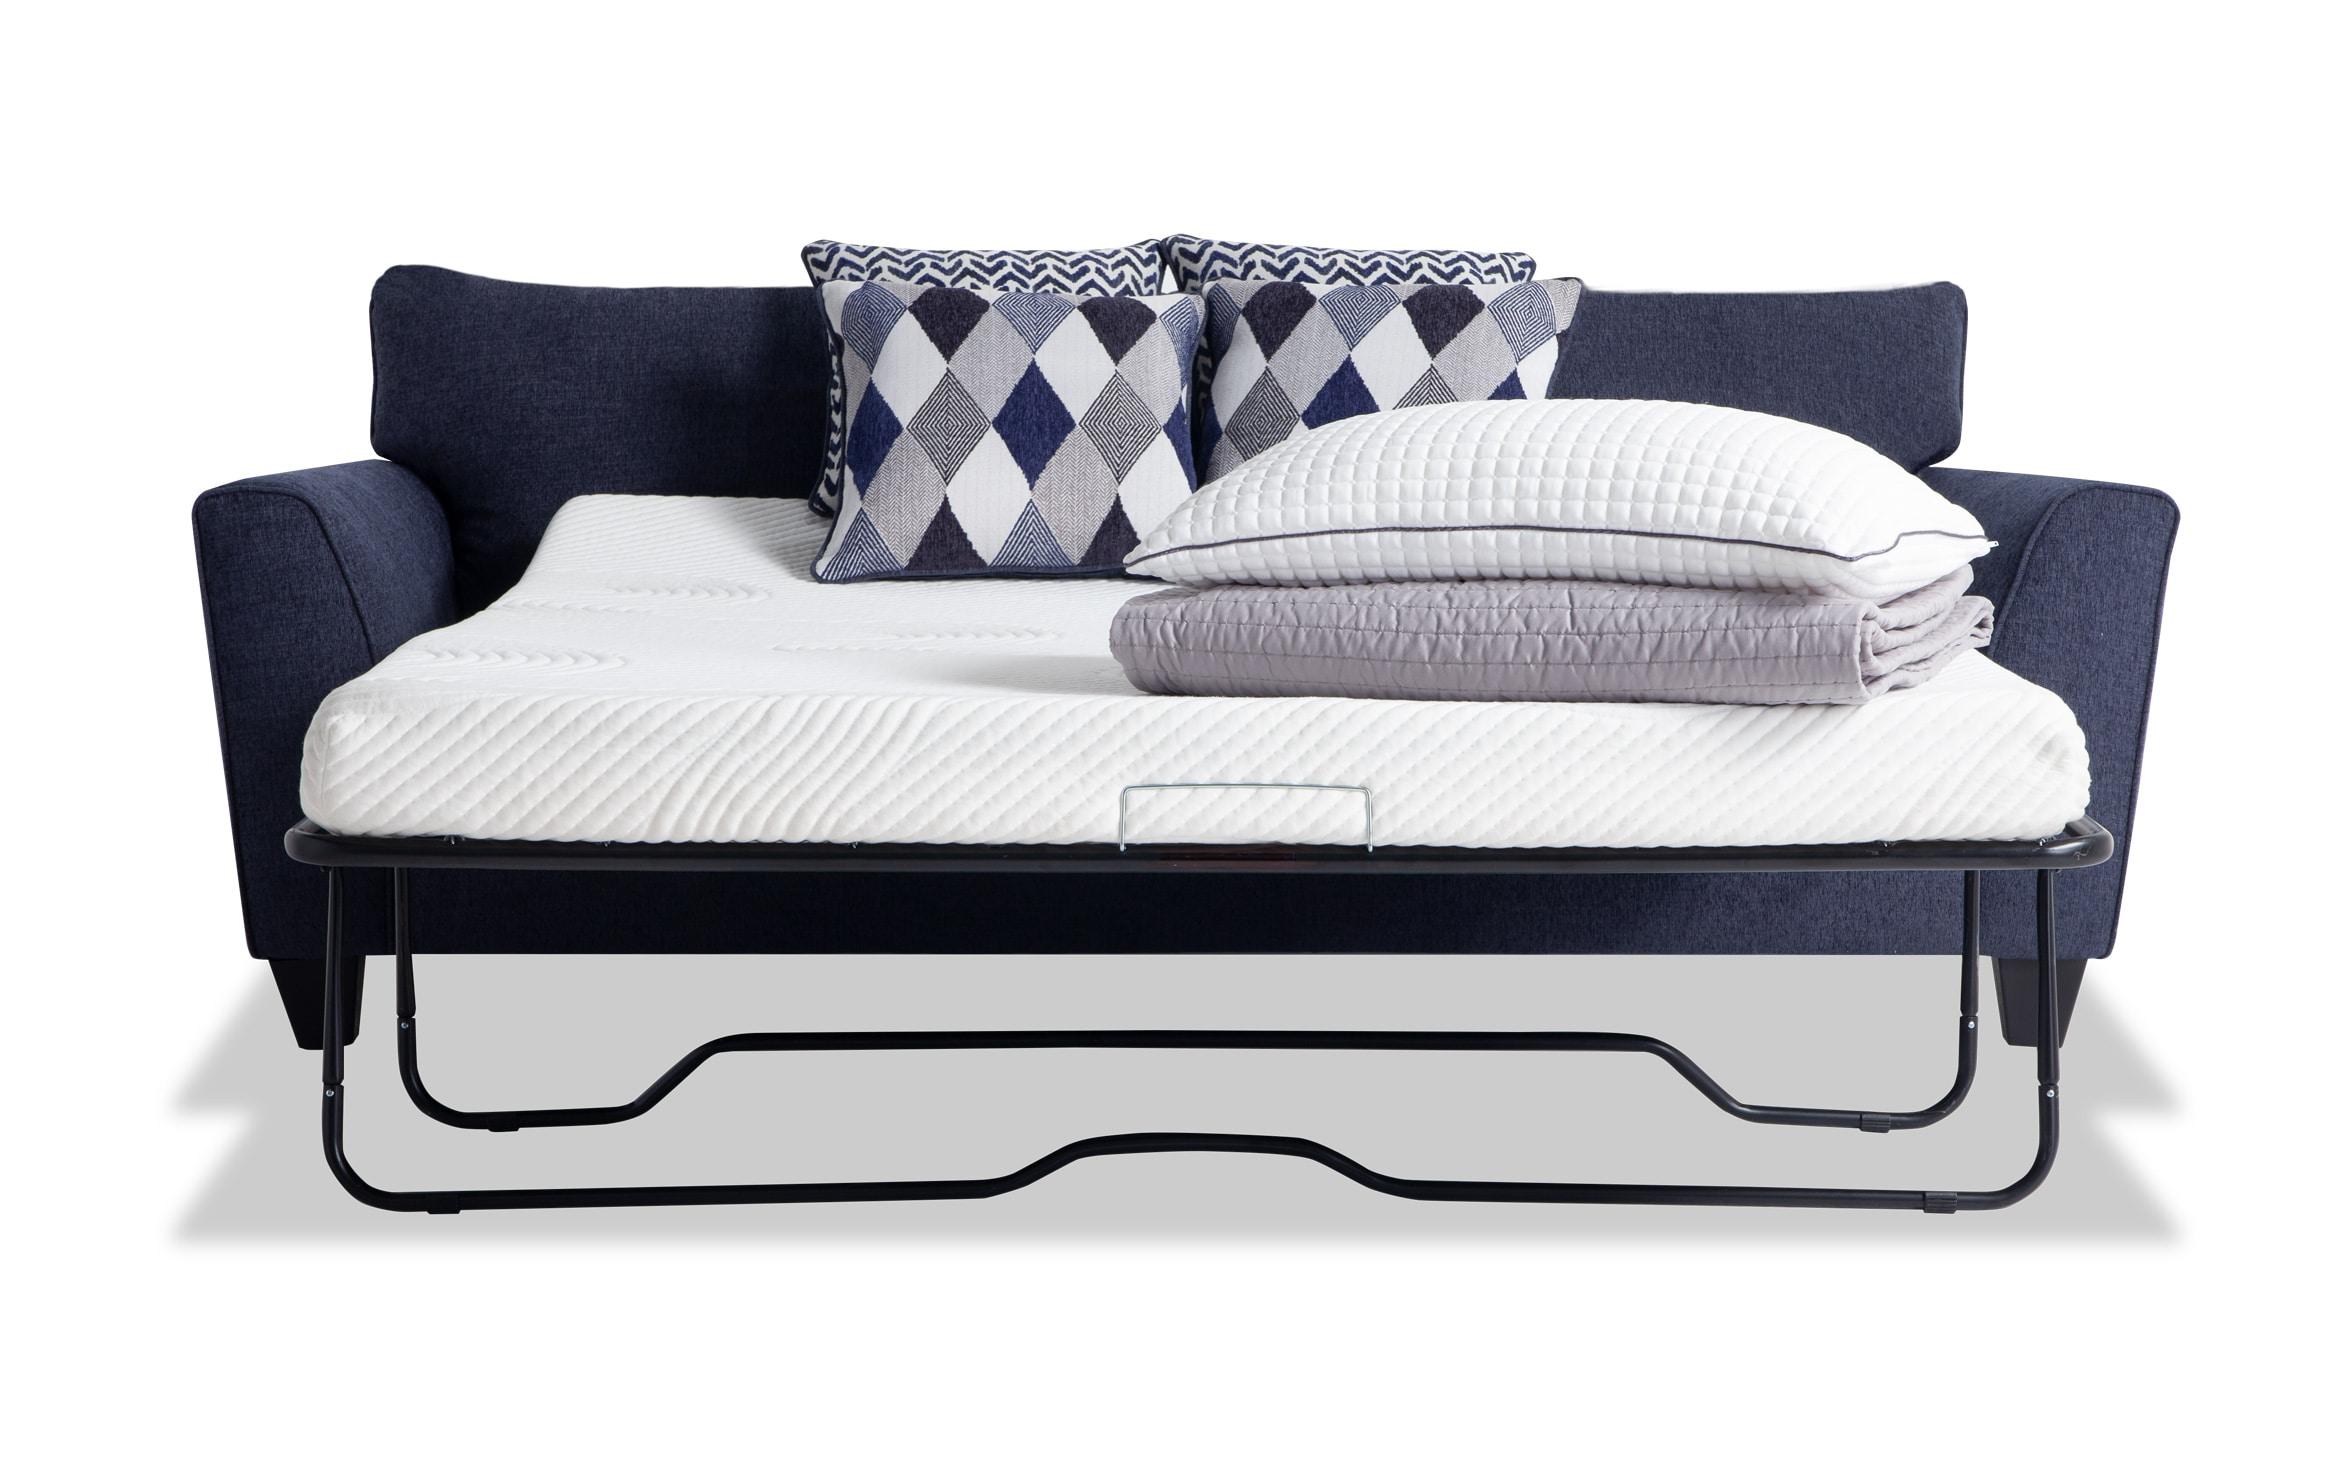 - Capri Denim Bob-O-Pedic Sleeper Sofa Bobs.com